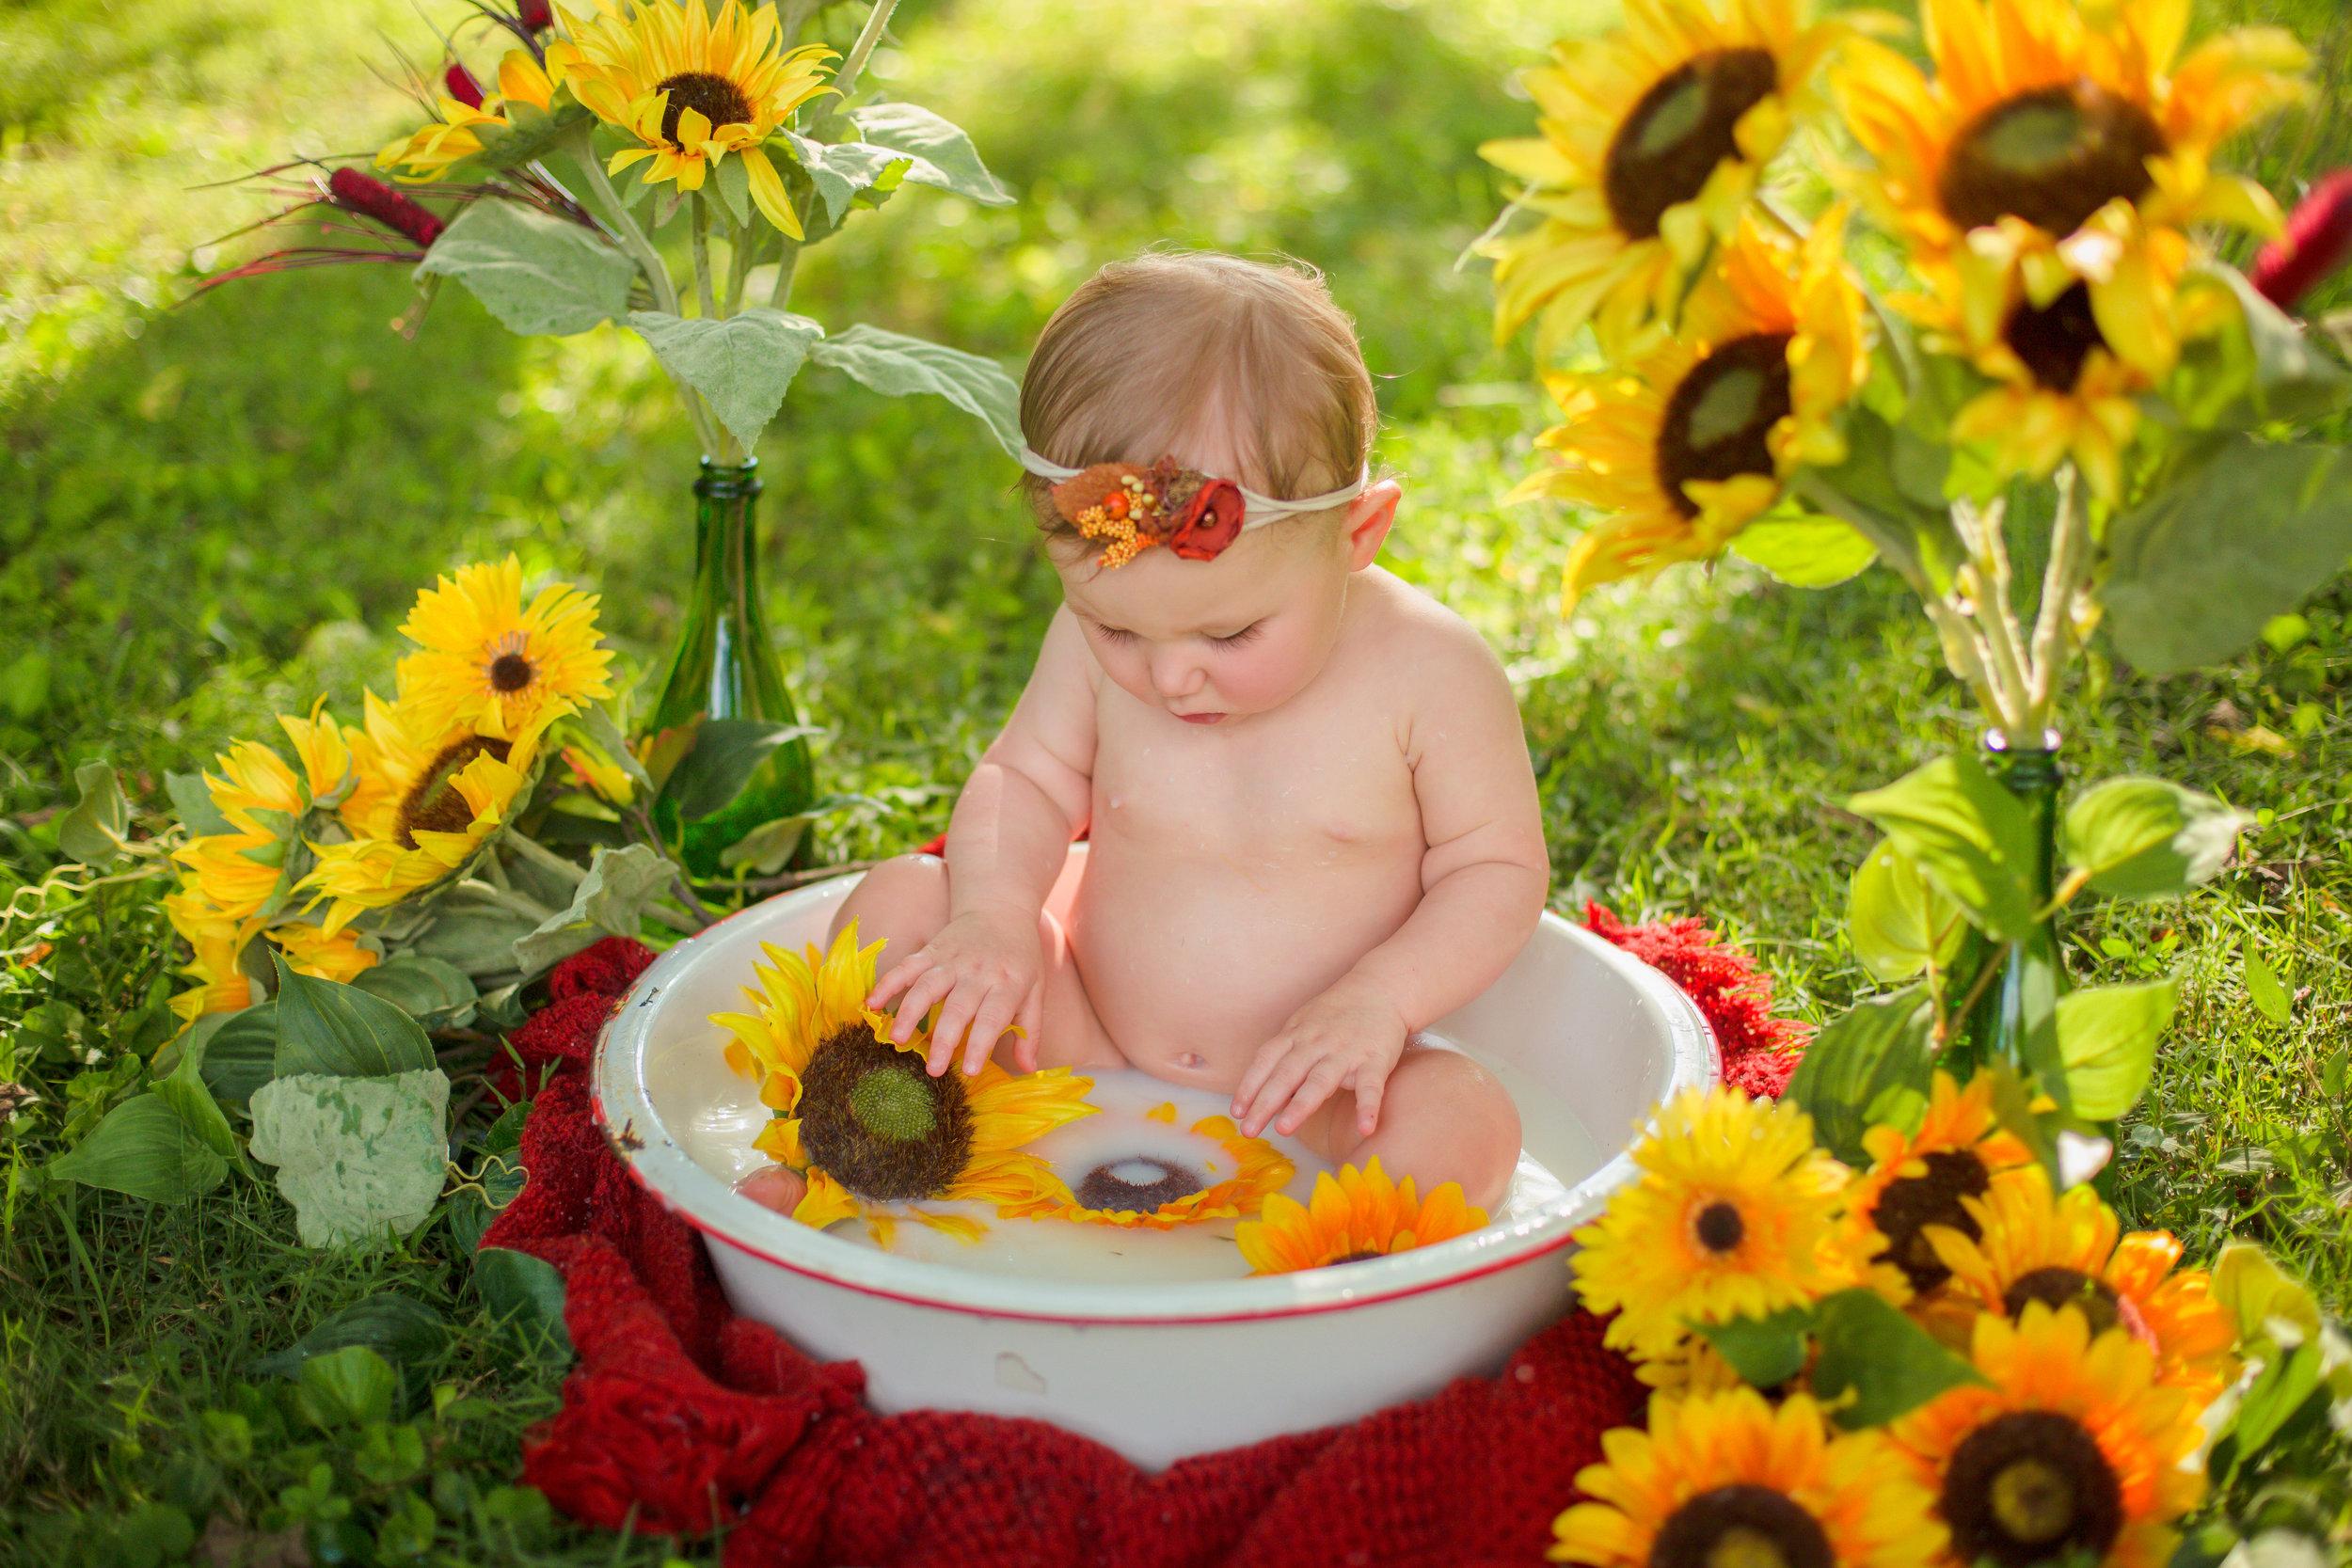 Sawyer-Jo-Sunflower-Milk-bath-Nashville-Family-Photographer-Chelsea-Meadows-Photography-(19).jpg